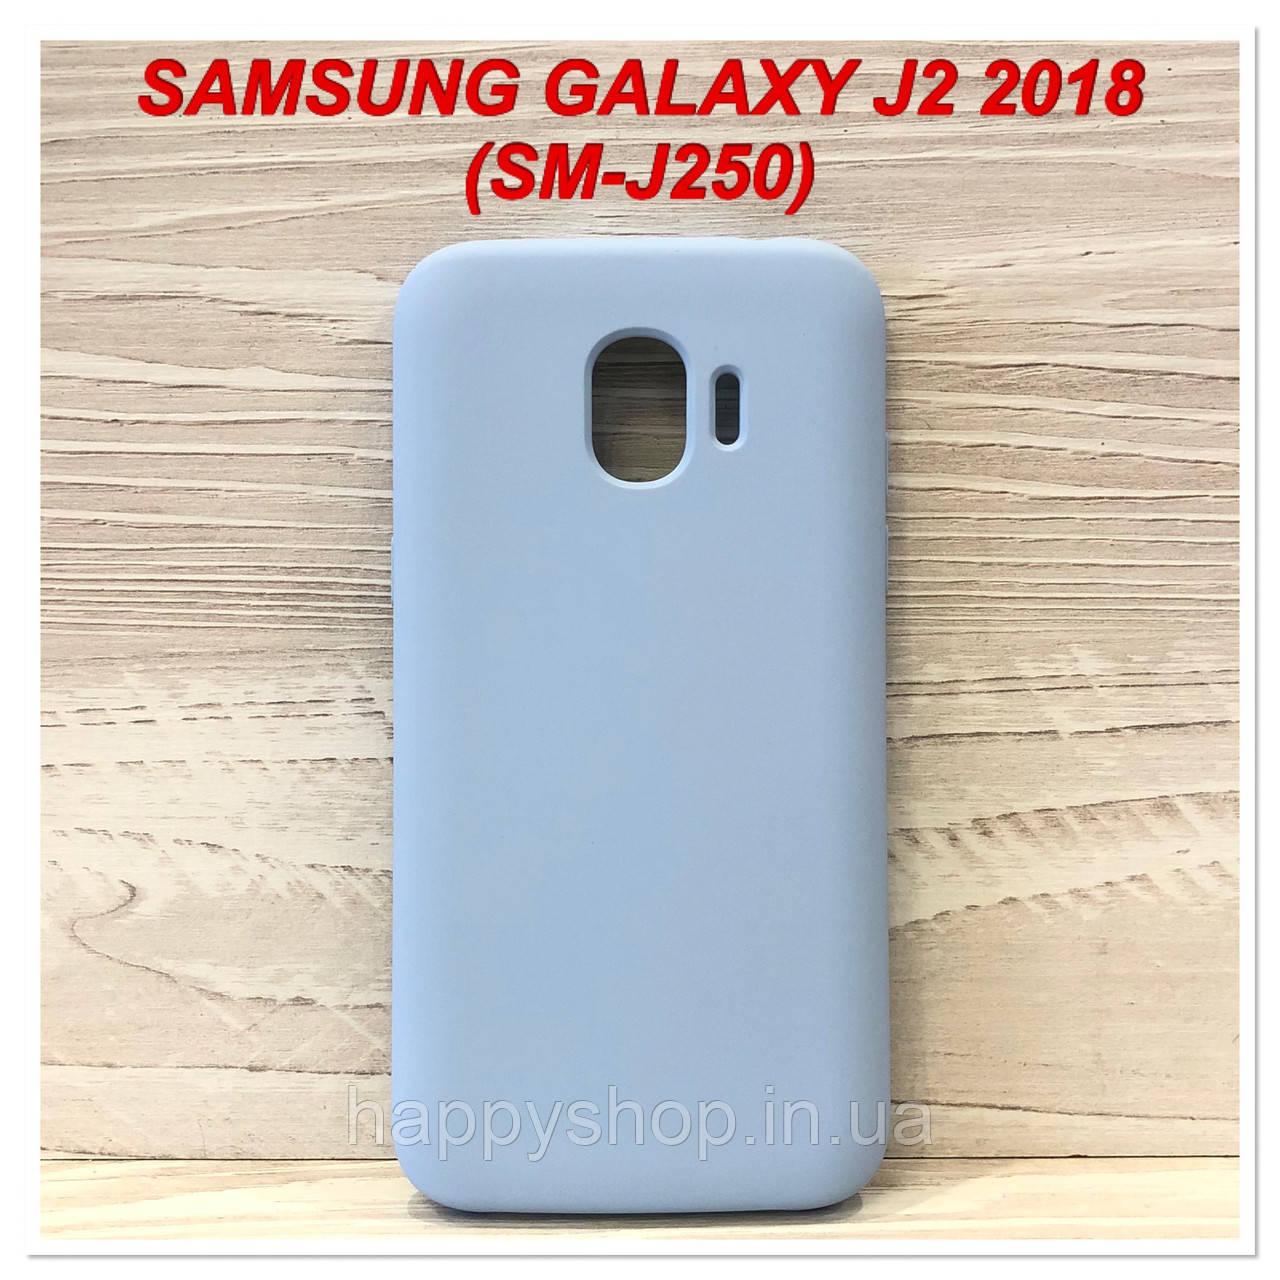 Чехол-накладка Soft touch для Samsung Galaxy J2 2018 (SM-J250) Голубой